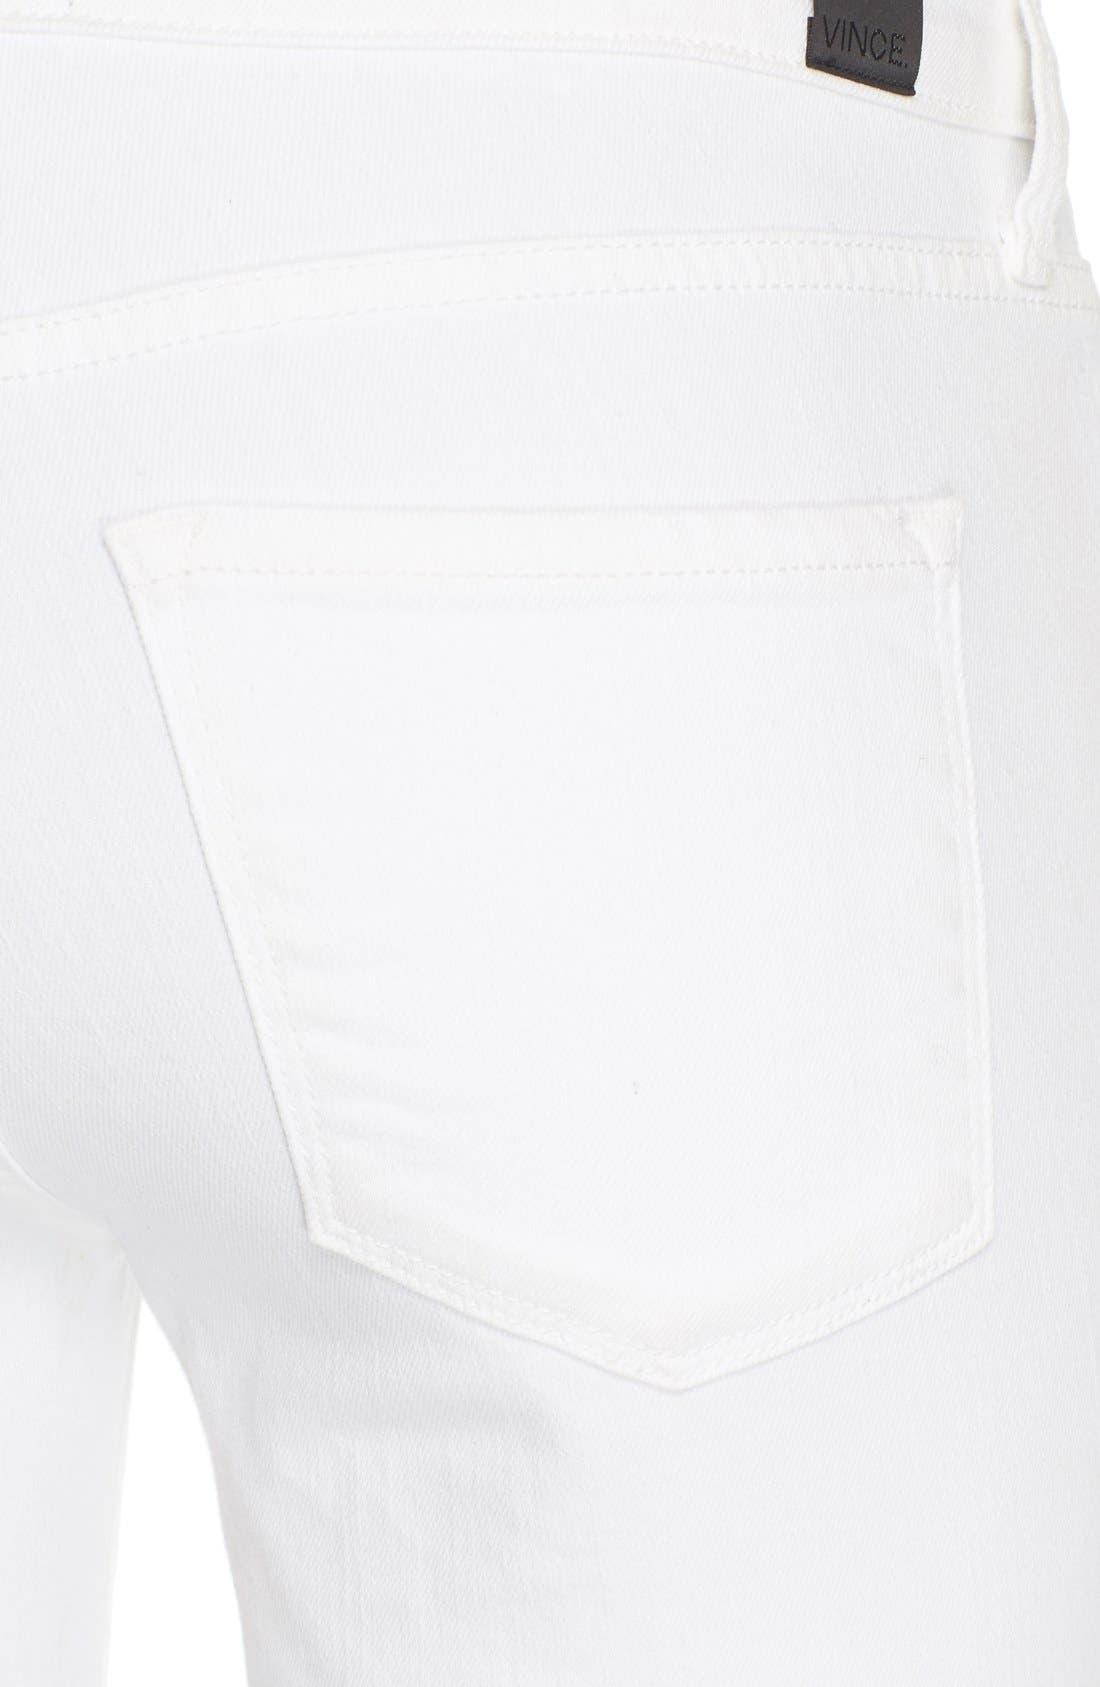 'Riley' Skinny Jeans,                             Alternate thumbnail 3, color,                             100